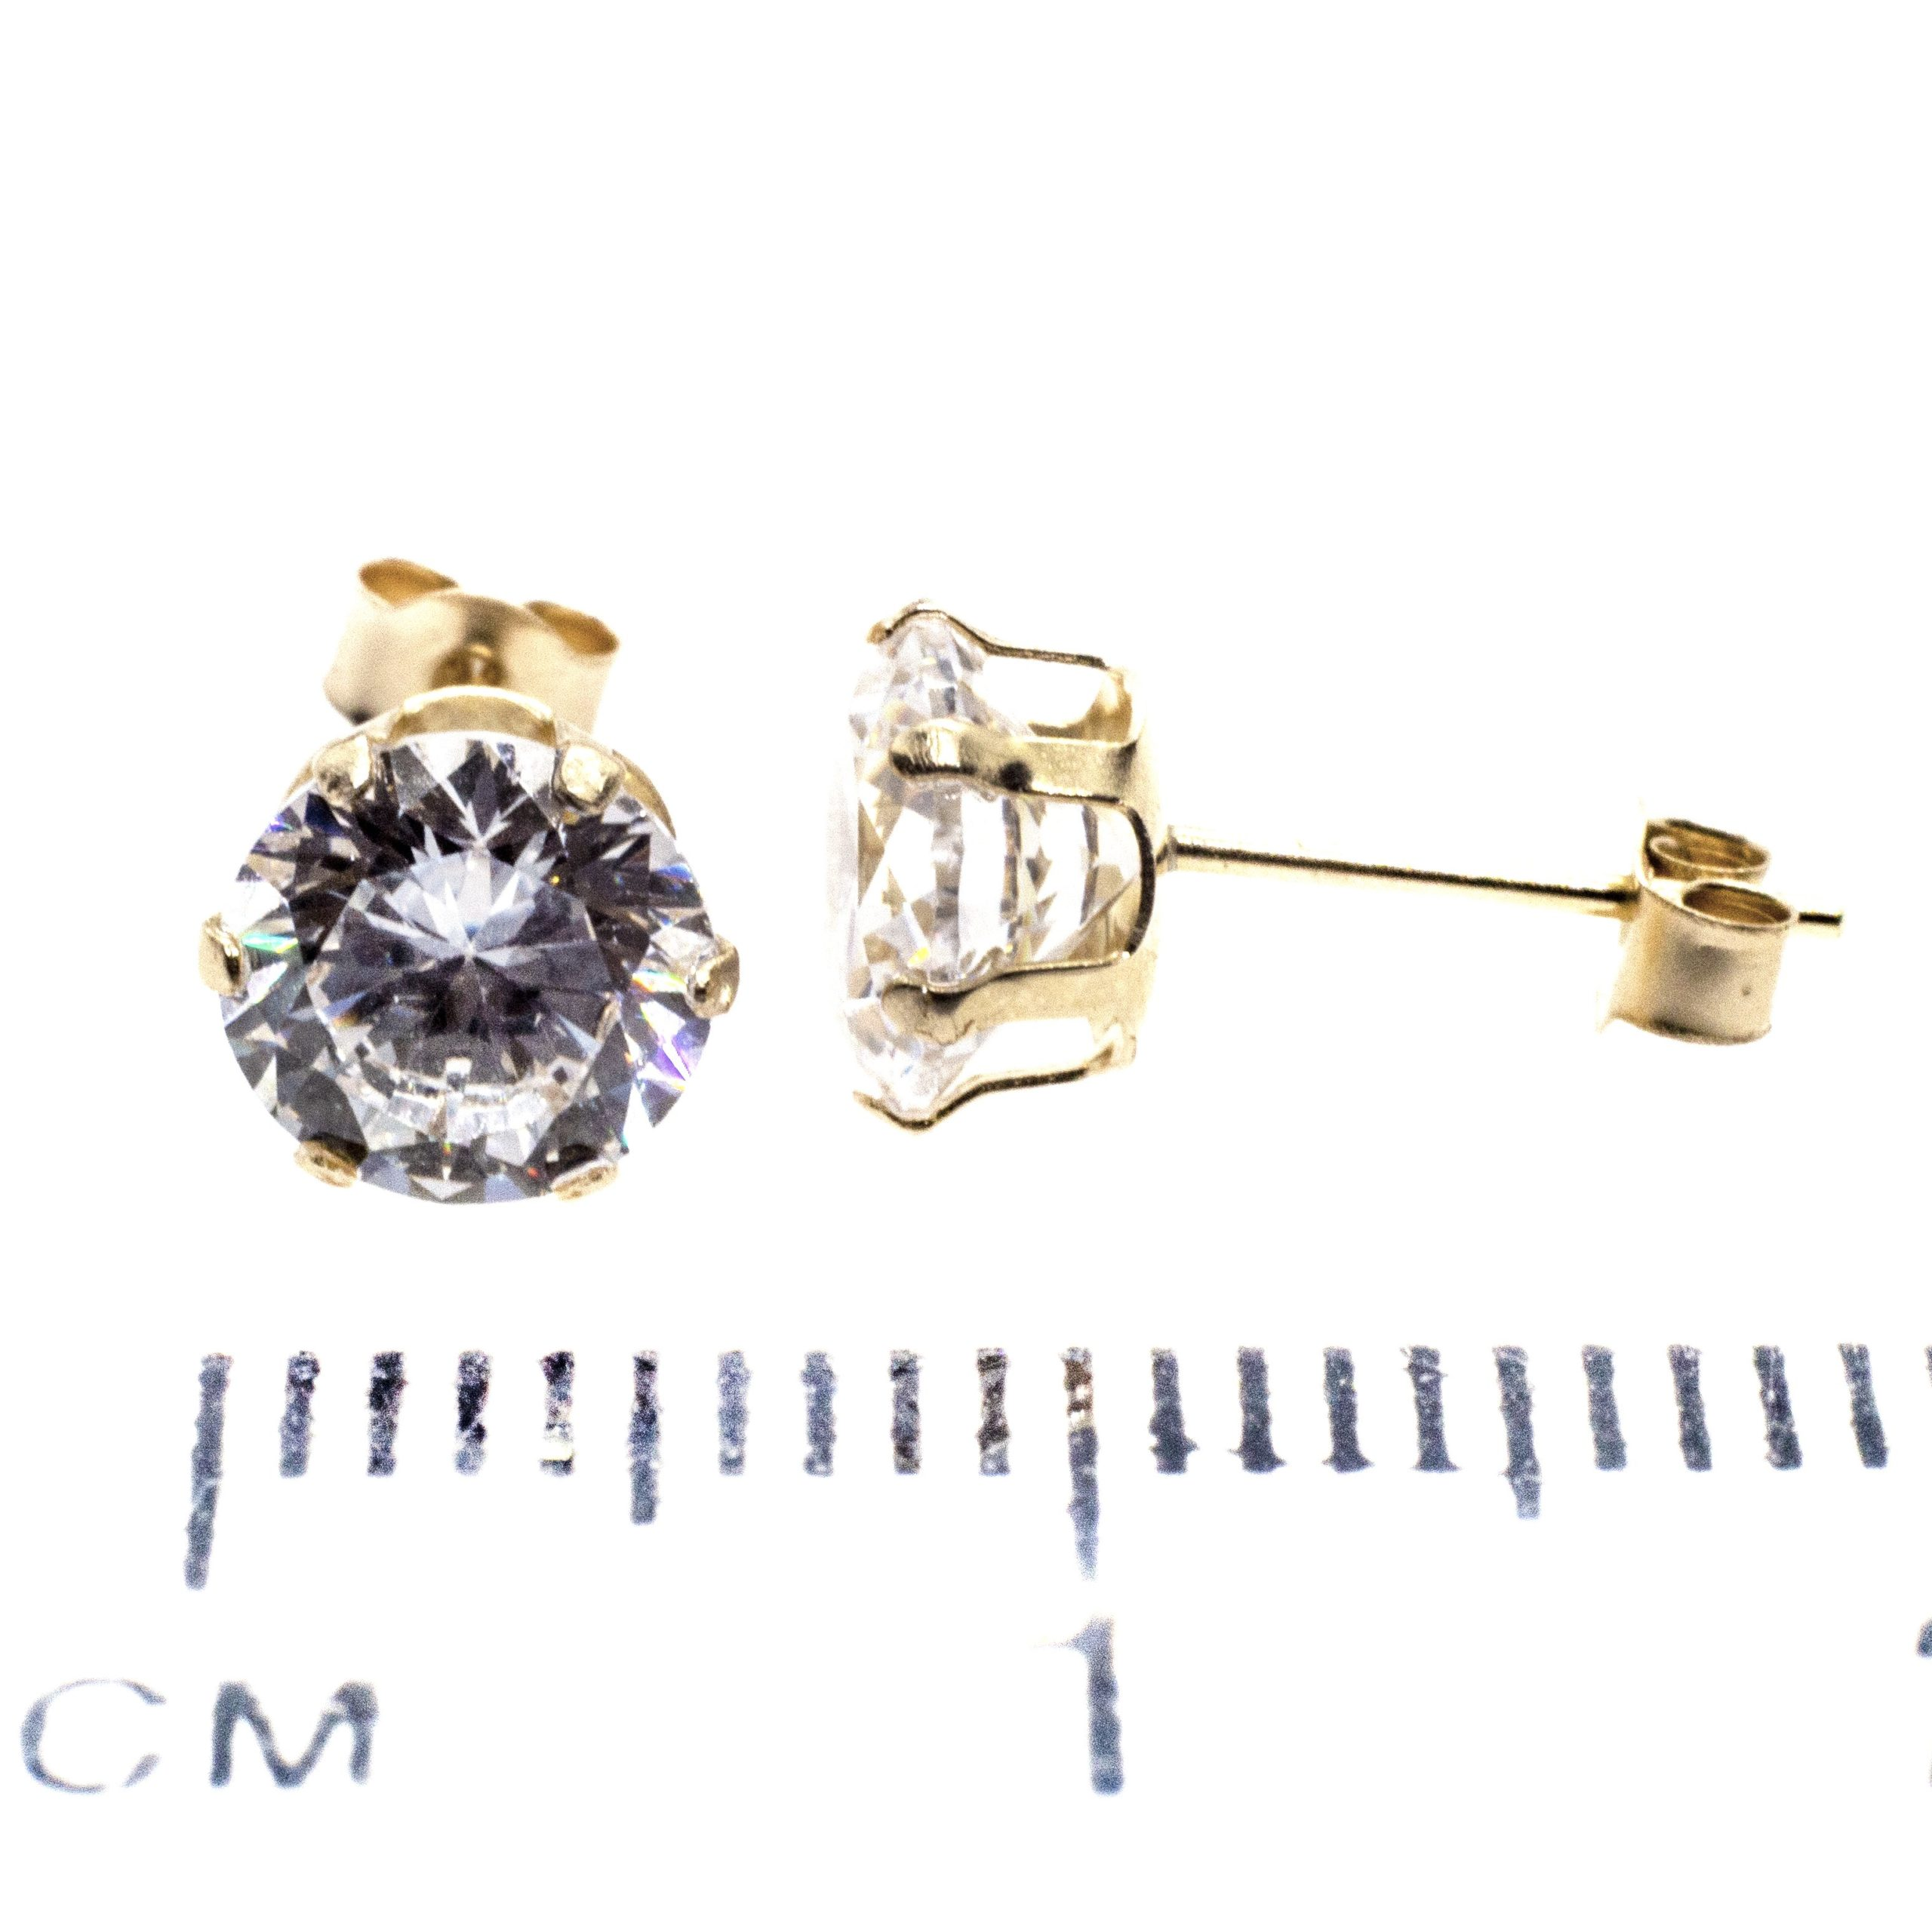 6mm CZ stud earrings 9ct yellow gold ruler